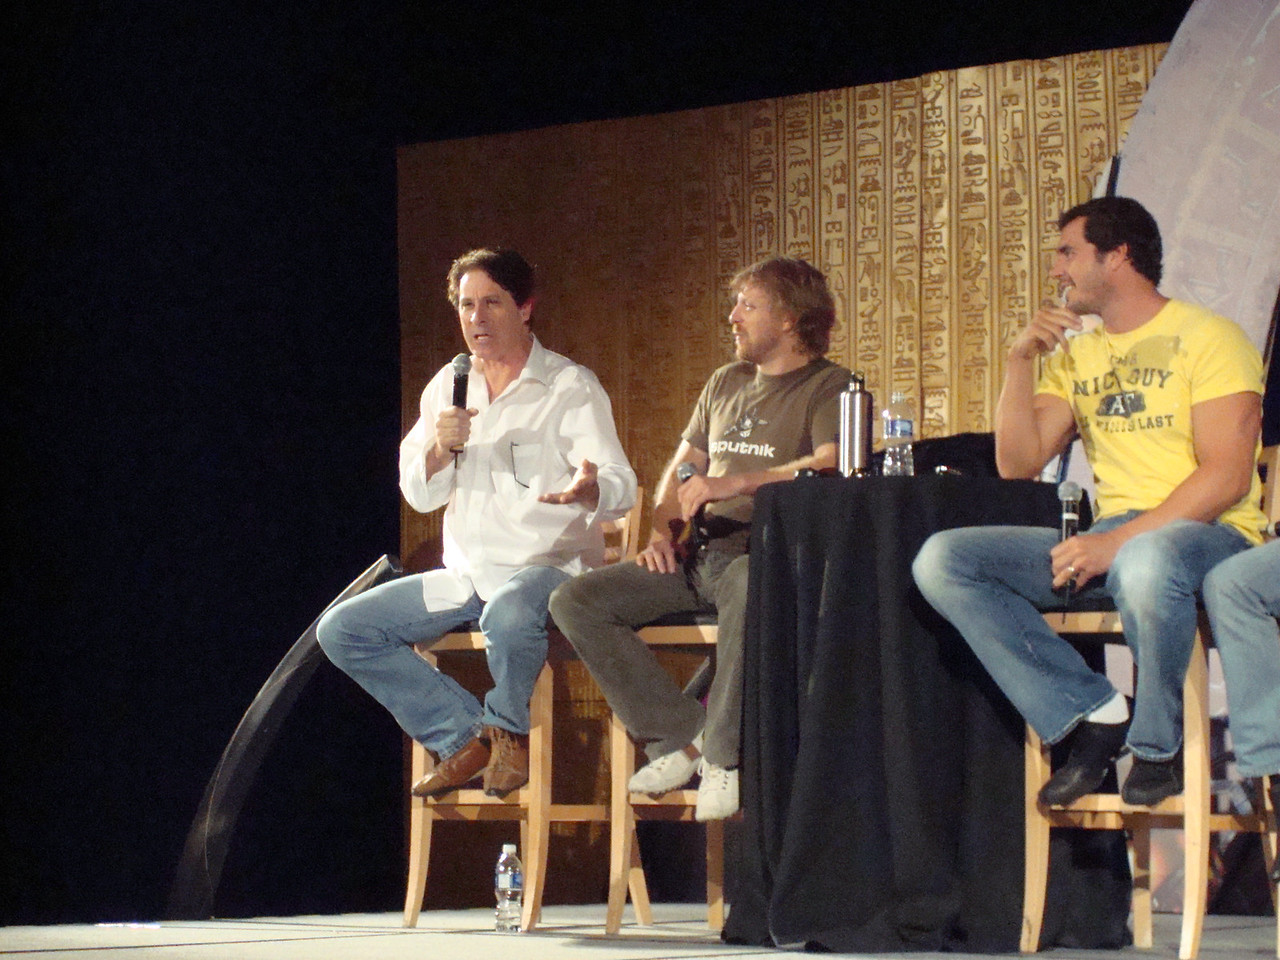 Garwin Sanford (Narim, Simon Wallis), Alex Zahara (a bunch of different Stargate characters), Dan Payne (Super Soldier, Wraith Warrior)